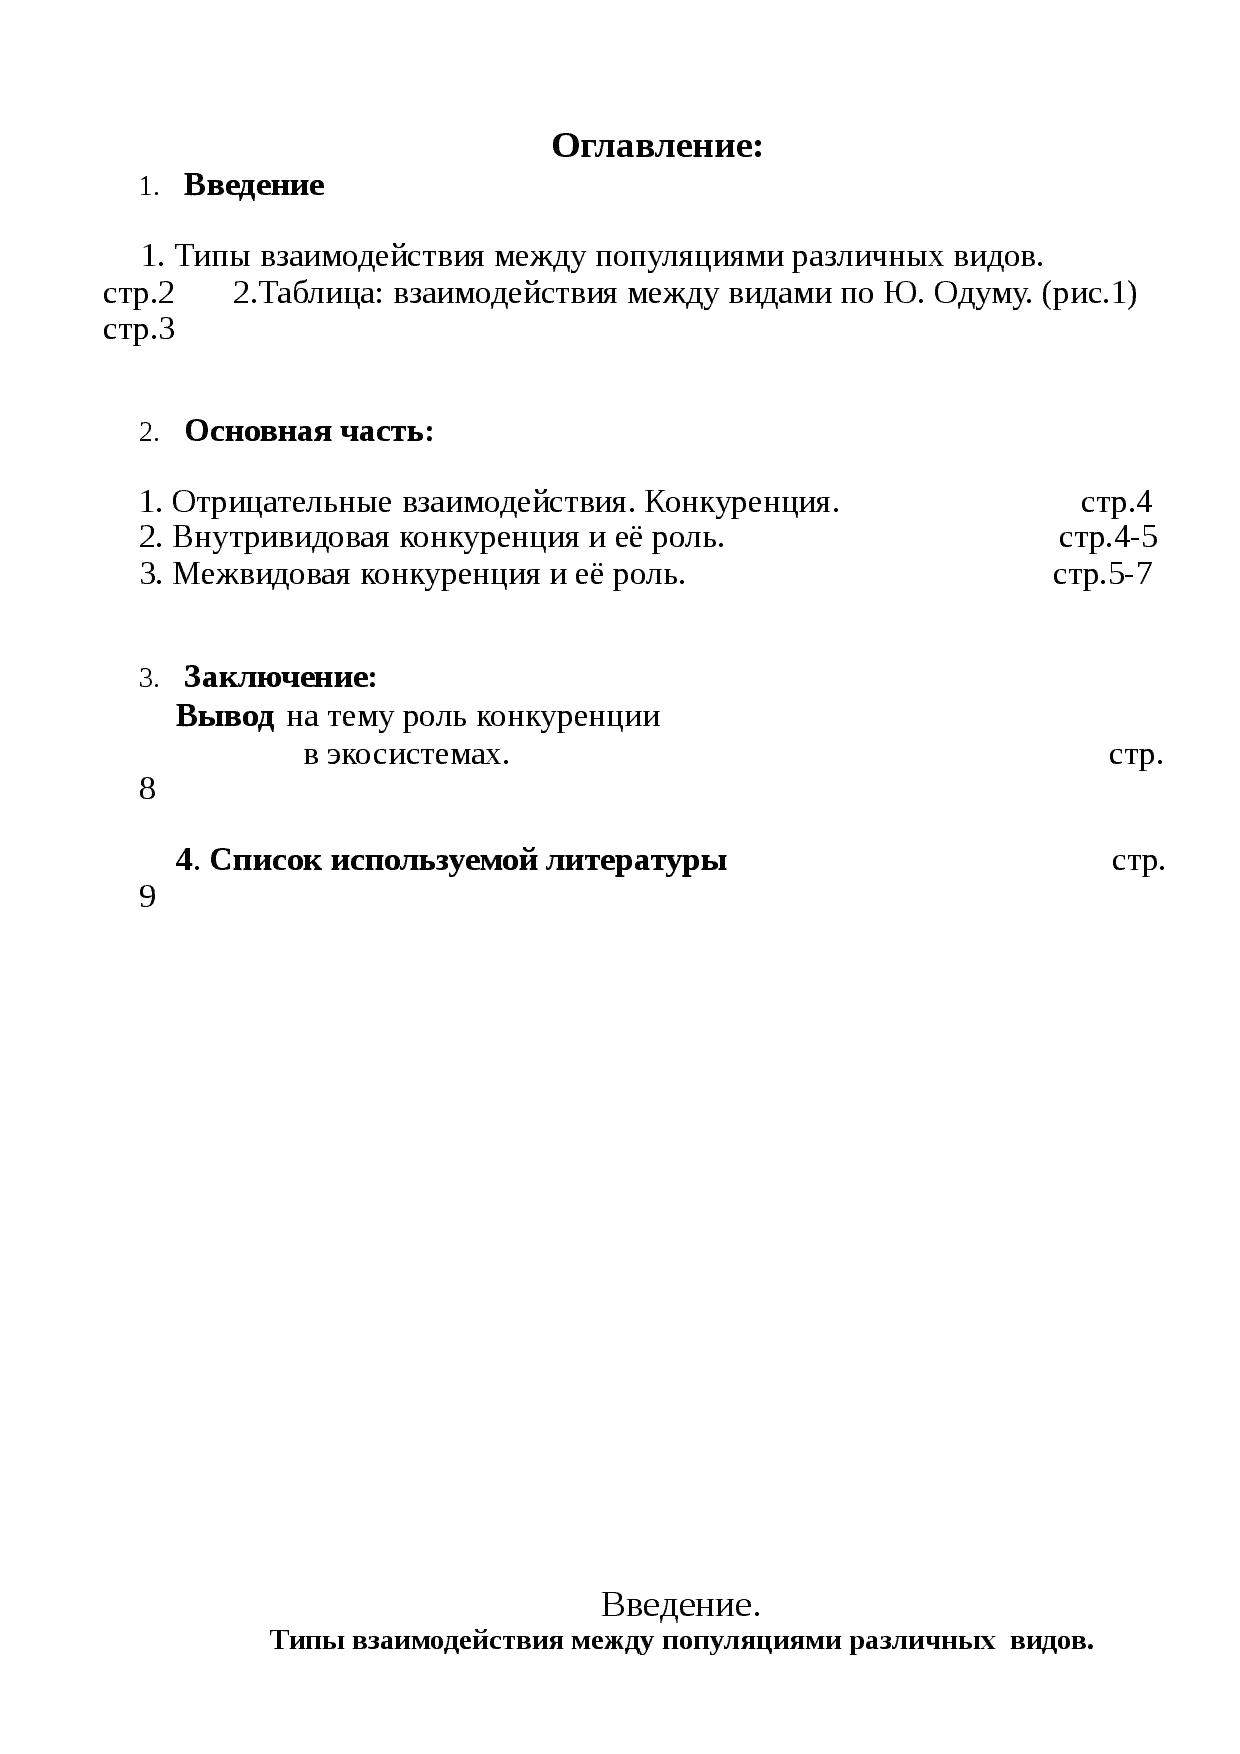 Конкуренция (биология) - competition (biology)